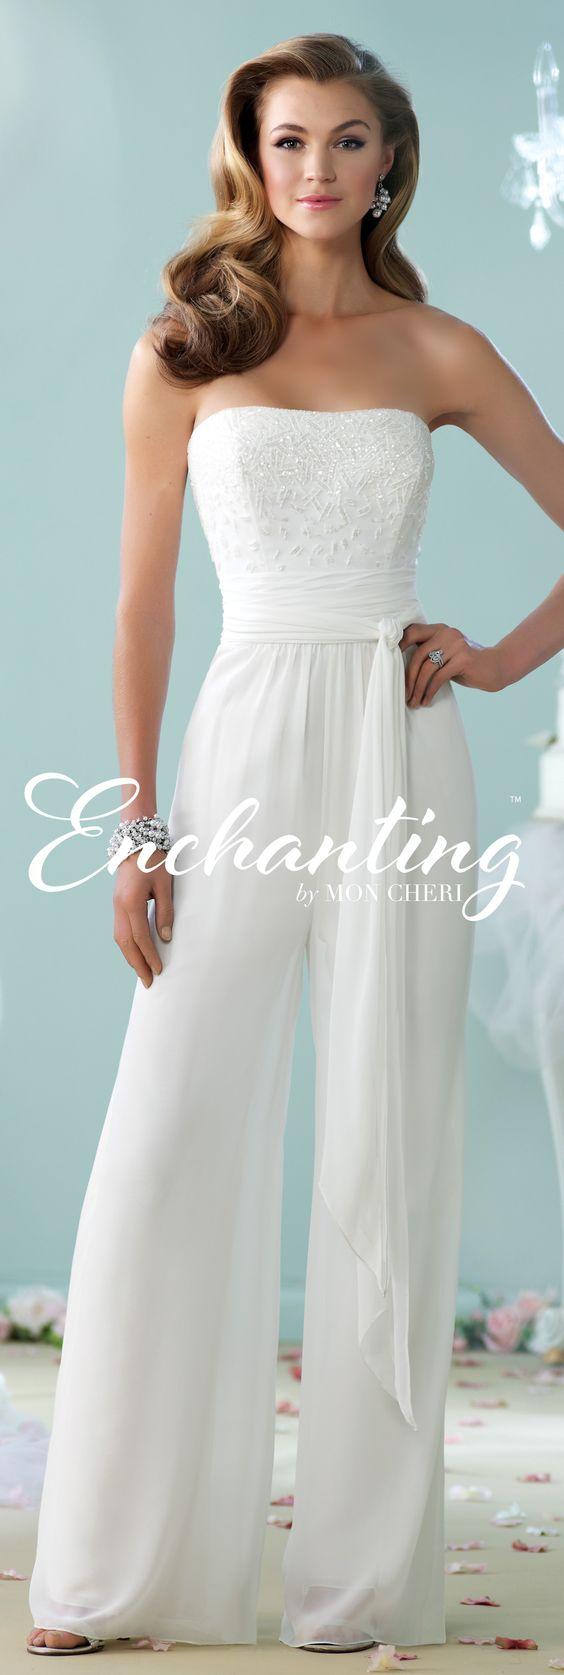 Modern Wedding Dresses 2018 by Mon Cheri   Hosenanzug ...